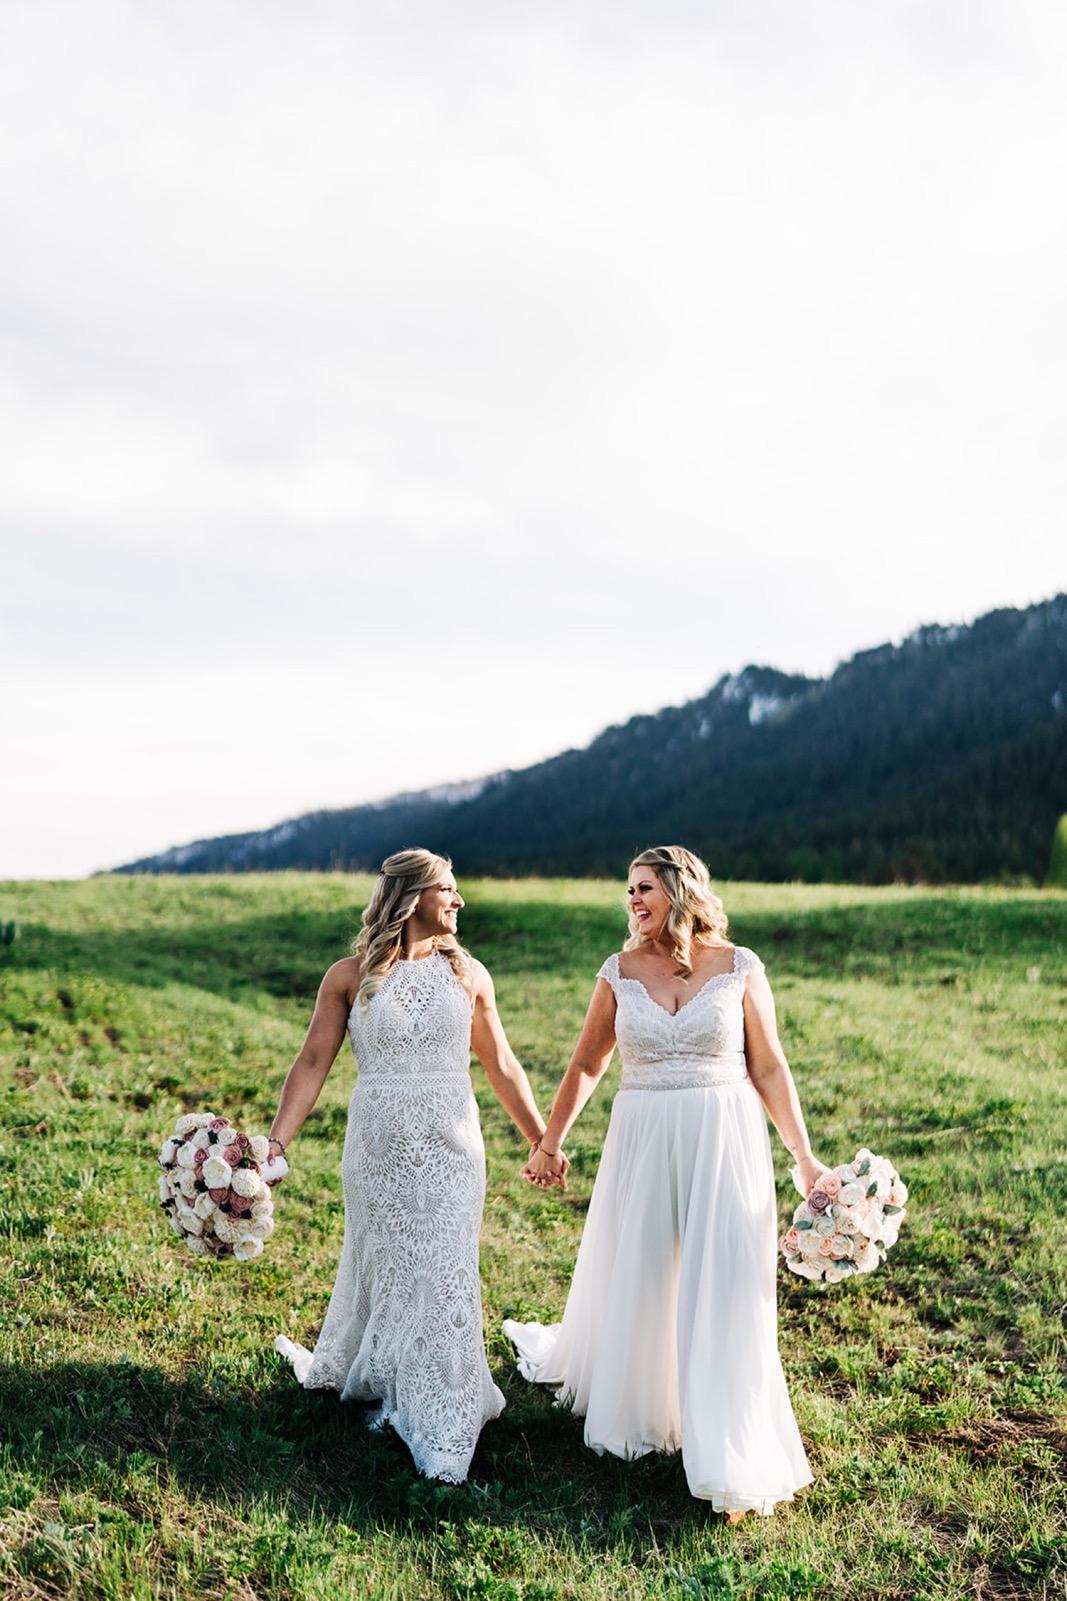 166_falissa_heather_wedding-478.jpg